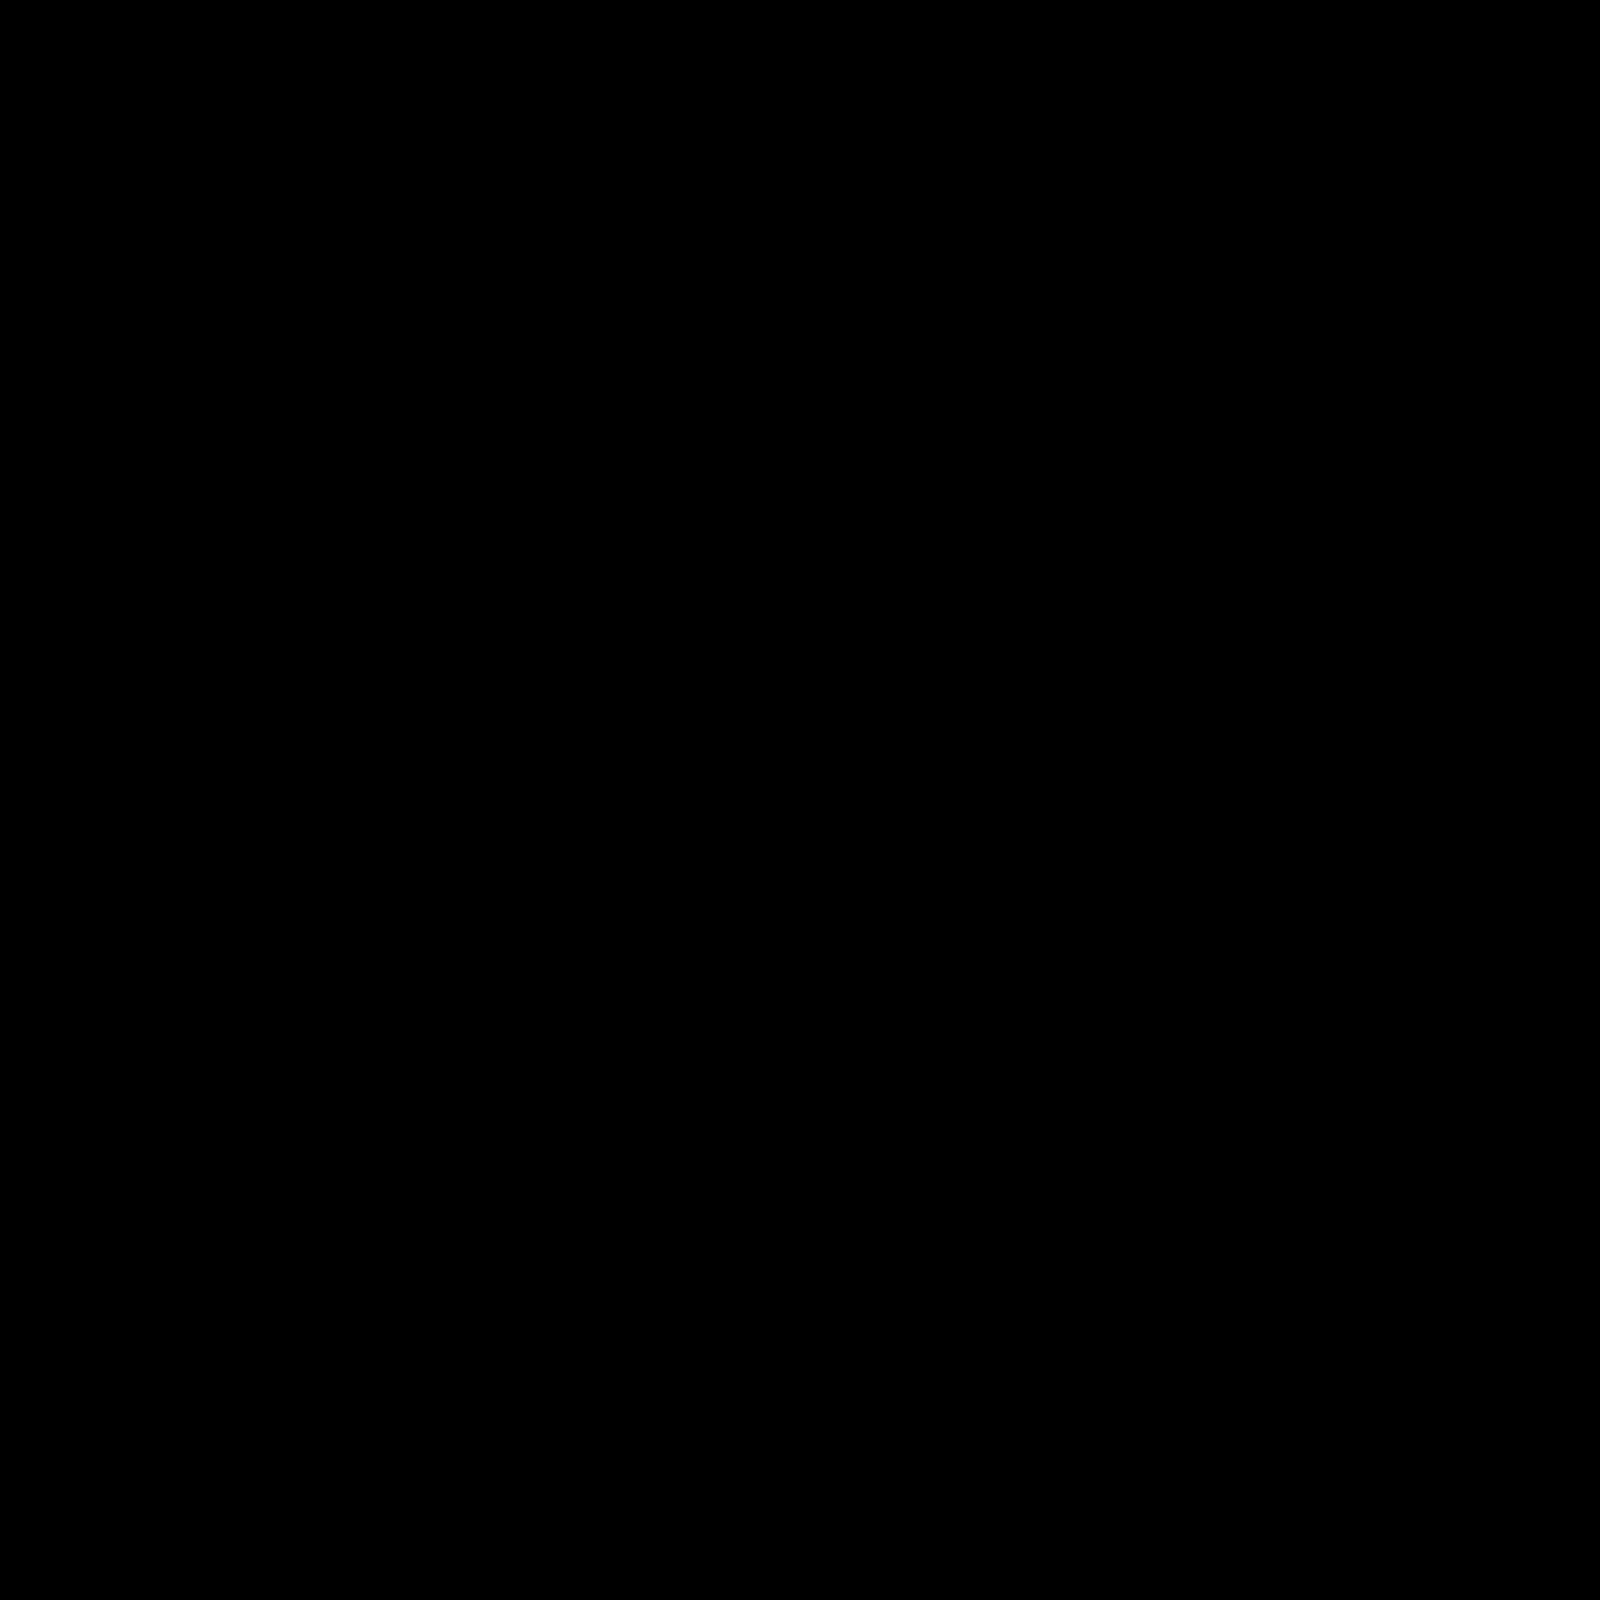 Symetria Logos